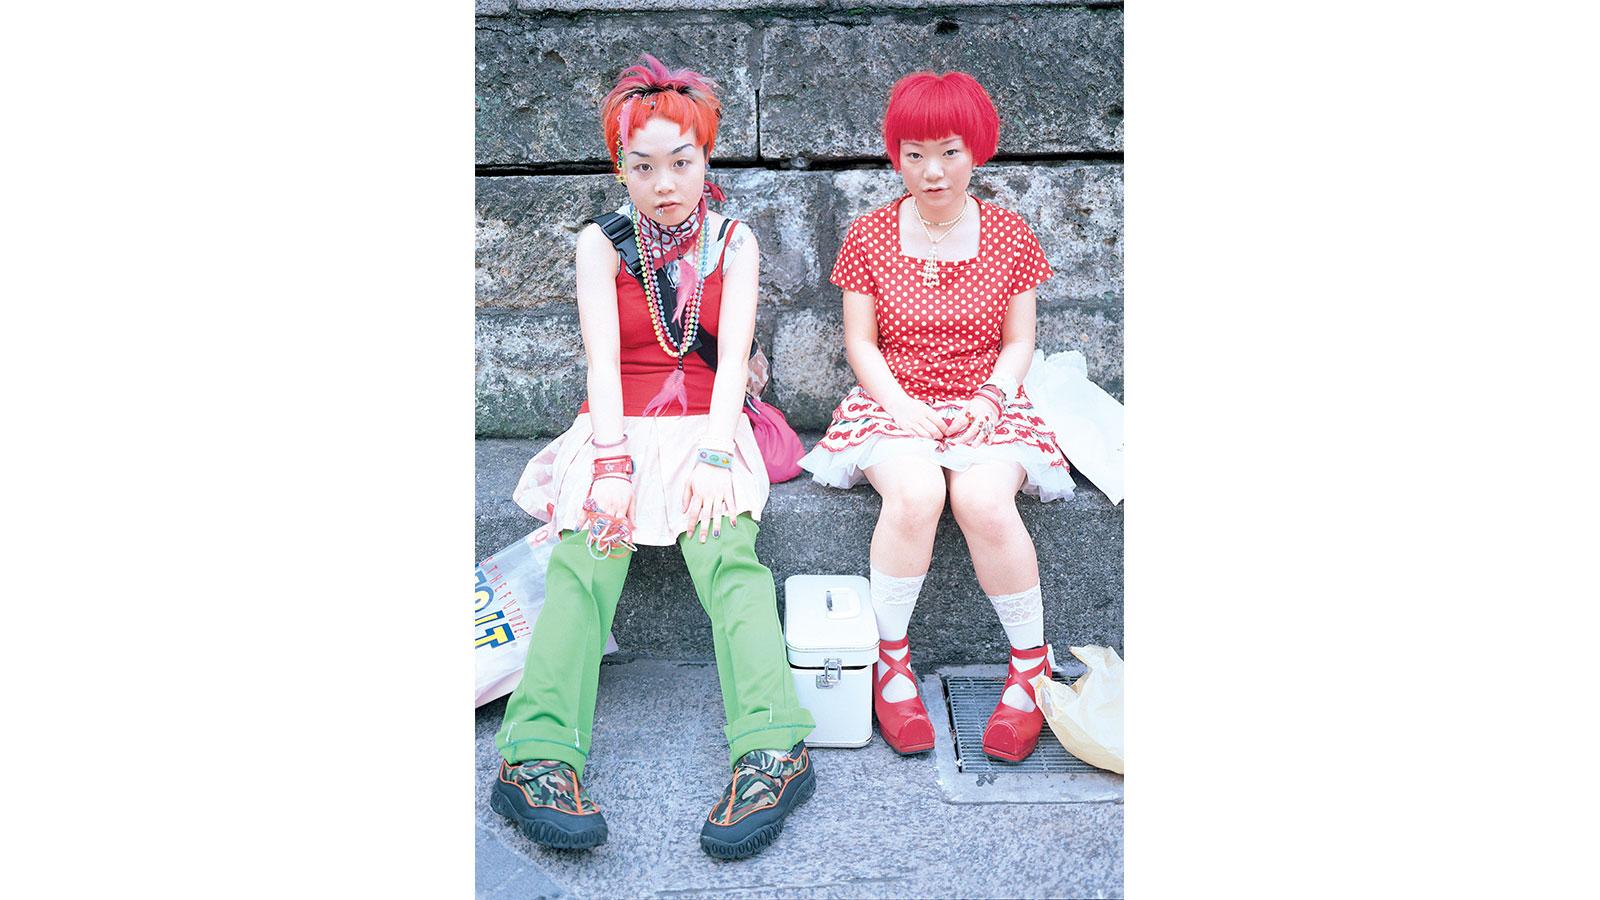 8b0719921d0 Photographer Shoichi Aoki on capturing Tokyo fashion - CNN Style